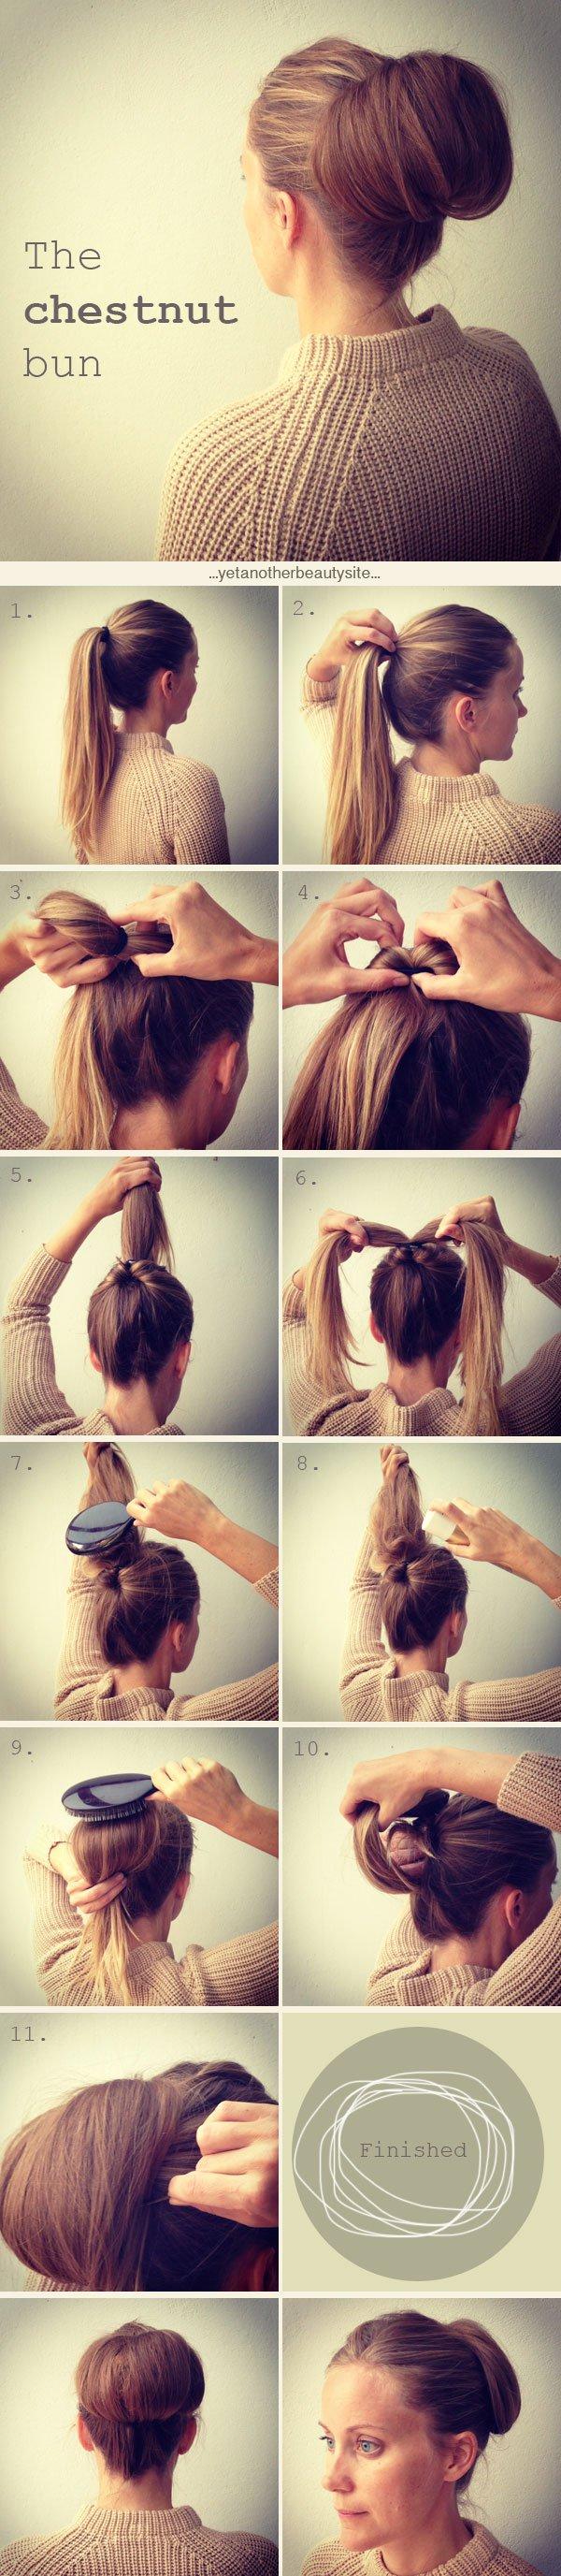 Cute Chestnut Bun Hairstyle for Women